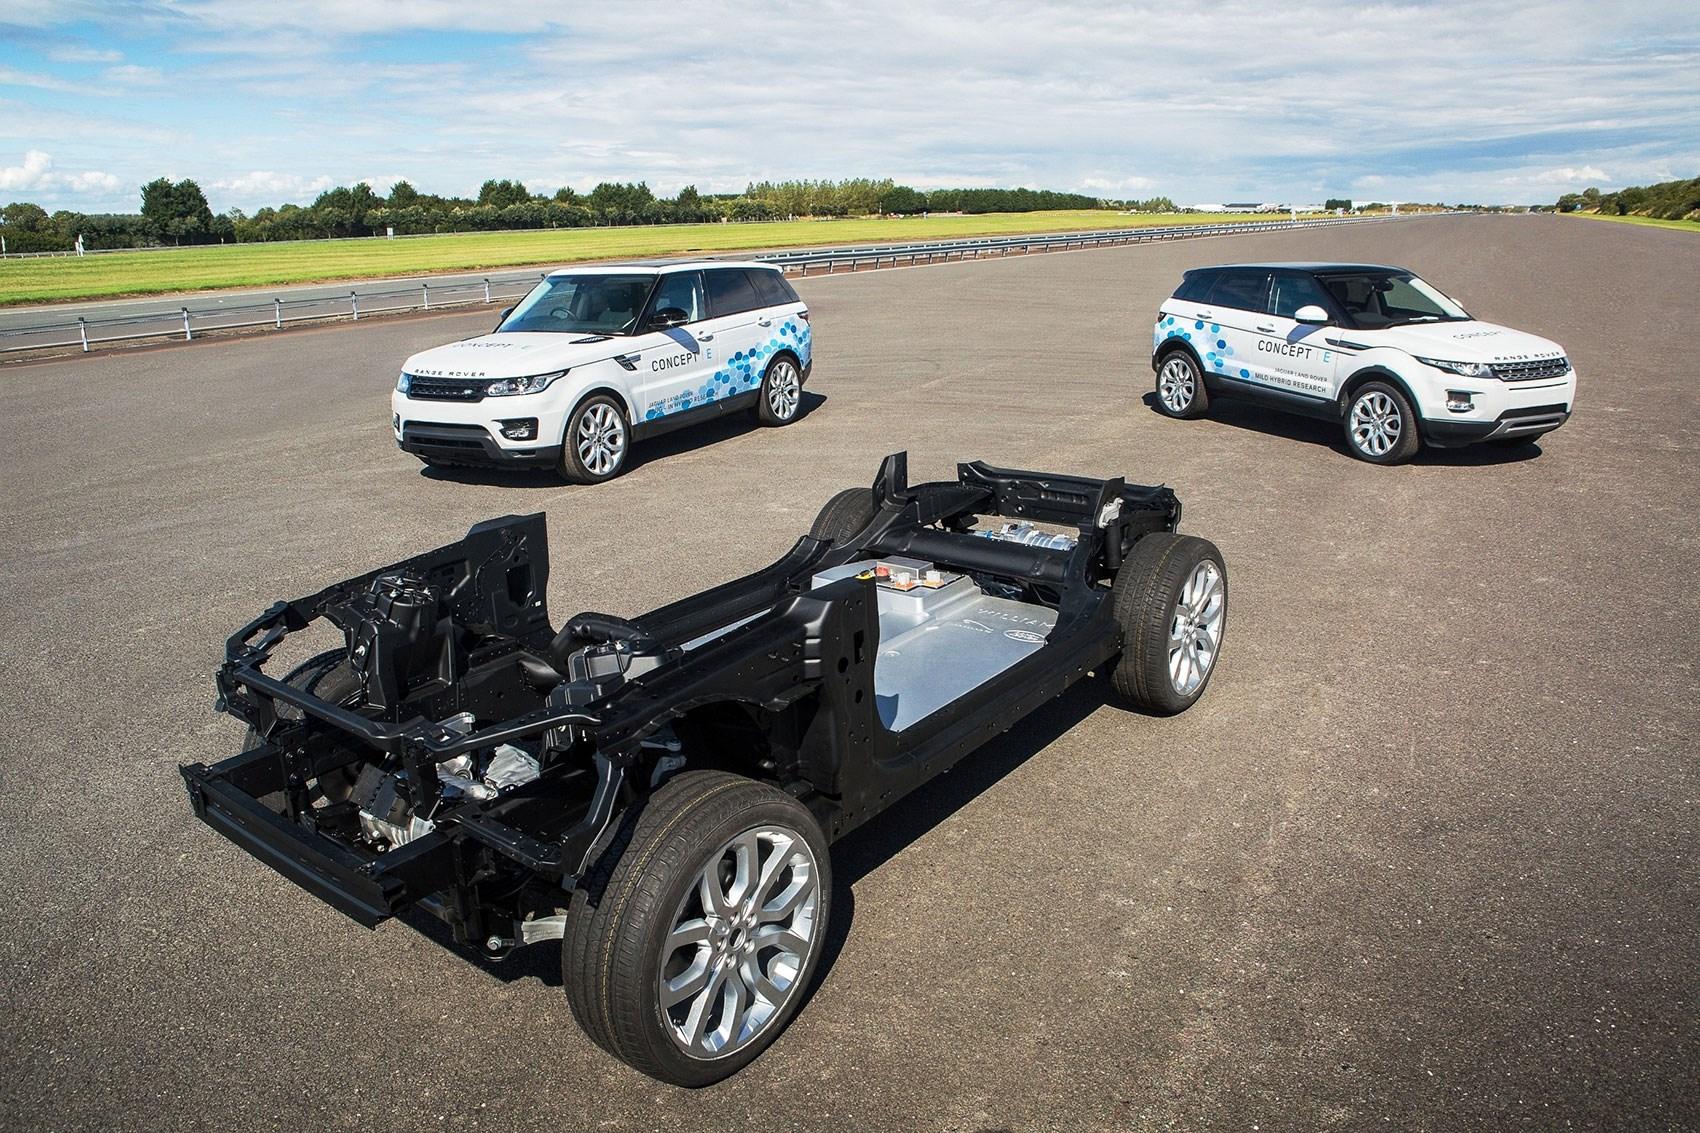 The Three New Jlr Concept Cars Range